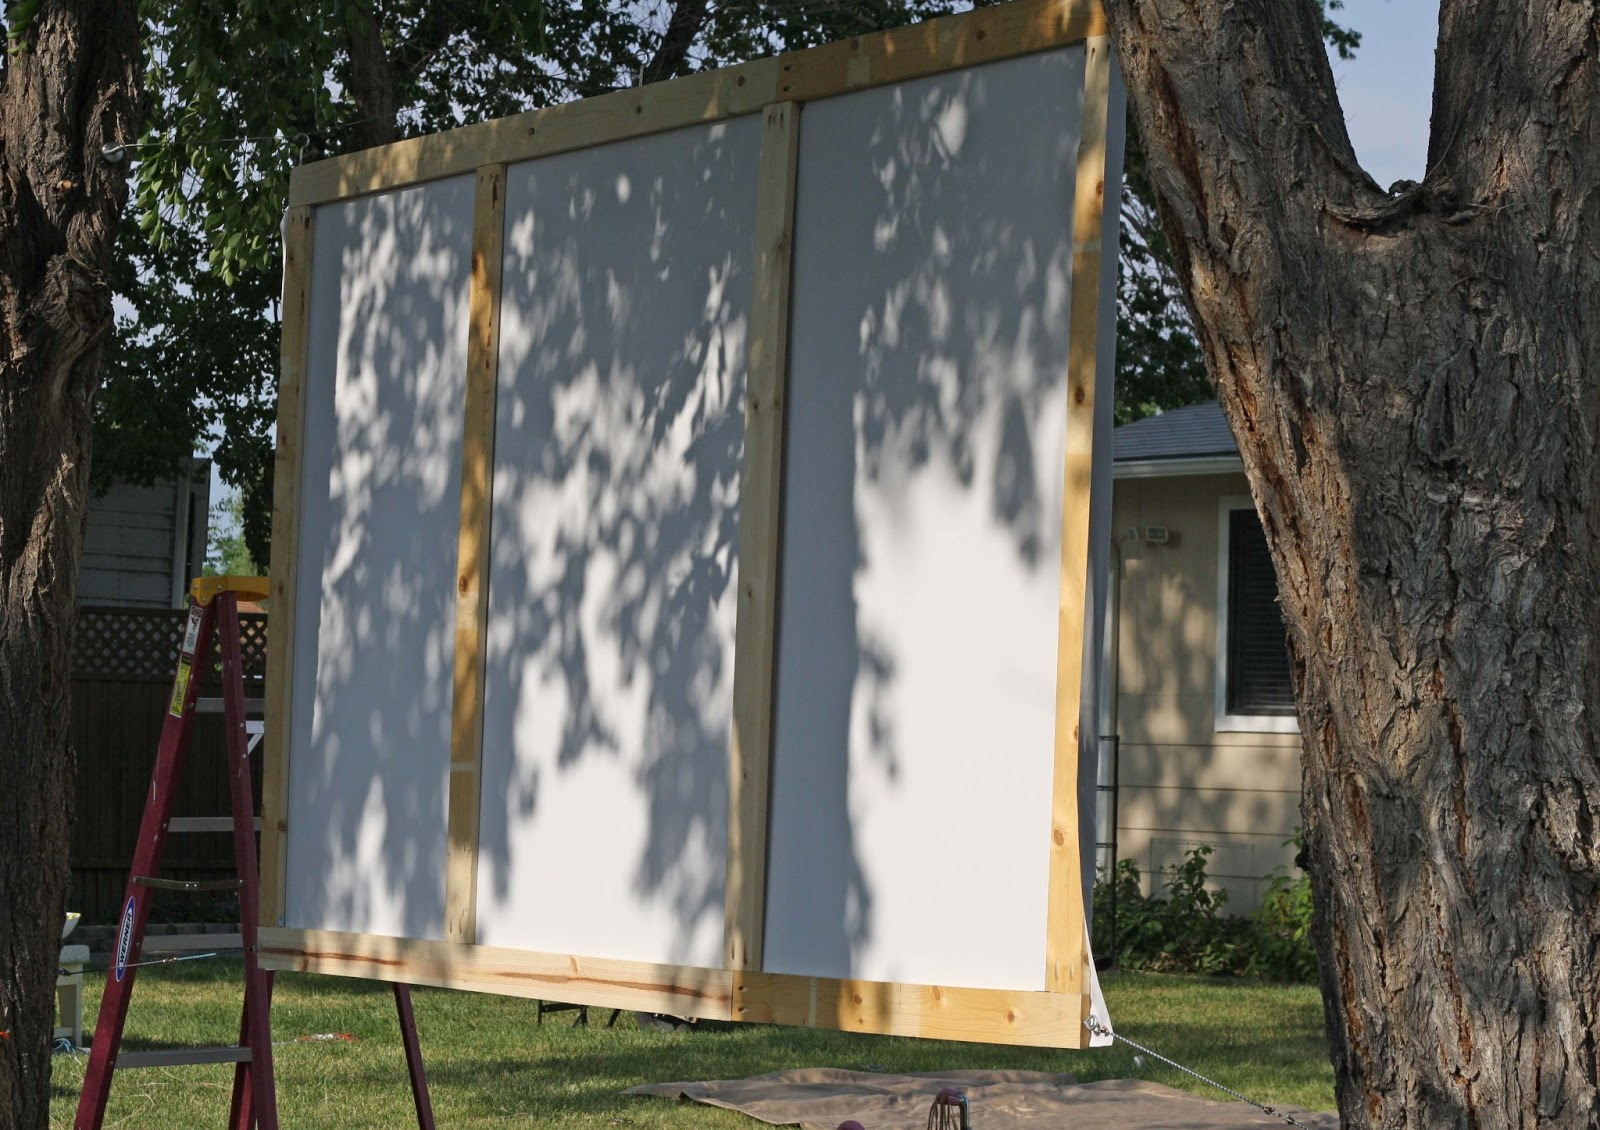 diy outdoor movie screen running with scissors bloglovin. Black Bedroom Furniture Sets. Home Design Ideas